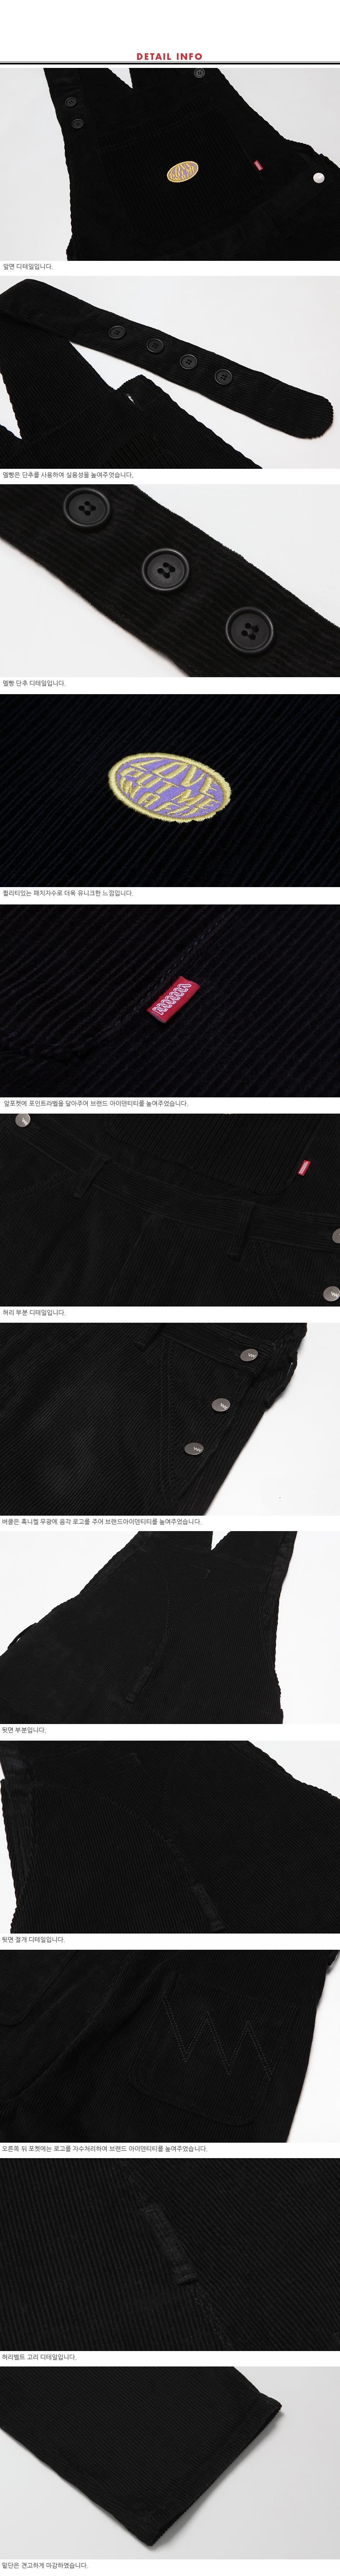 SYLP7200_detail_black.jpg